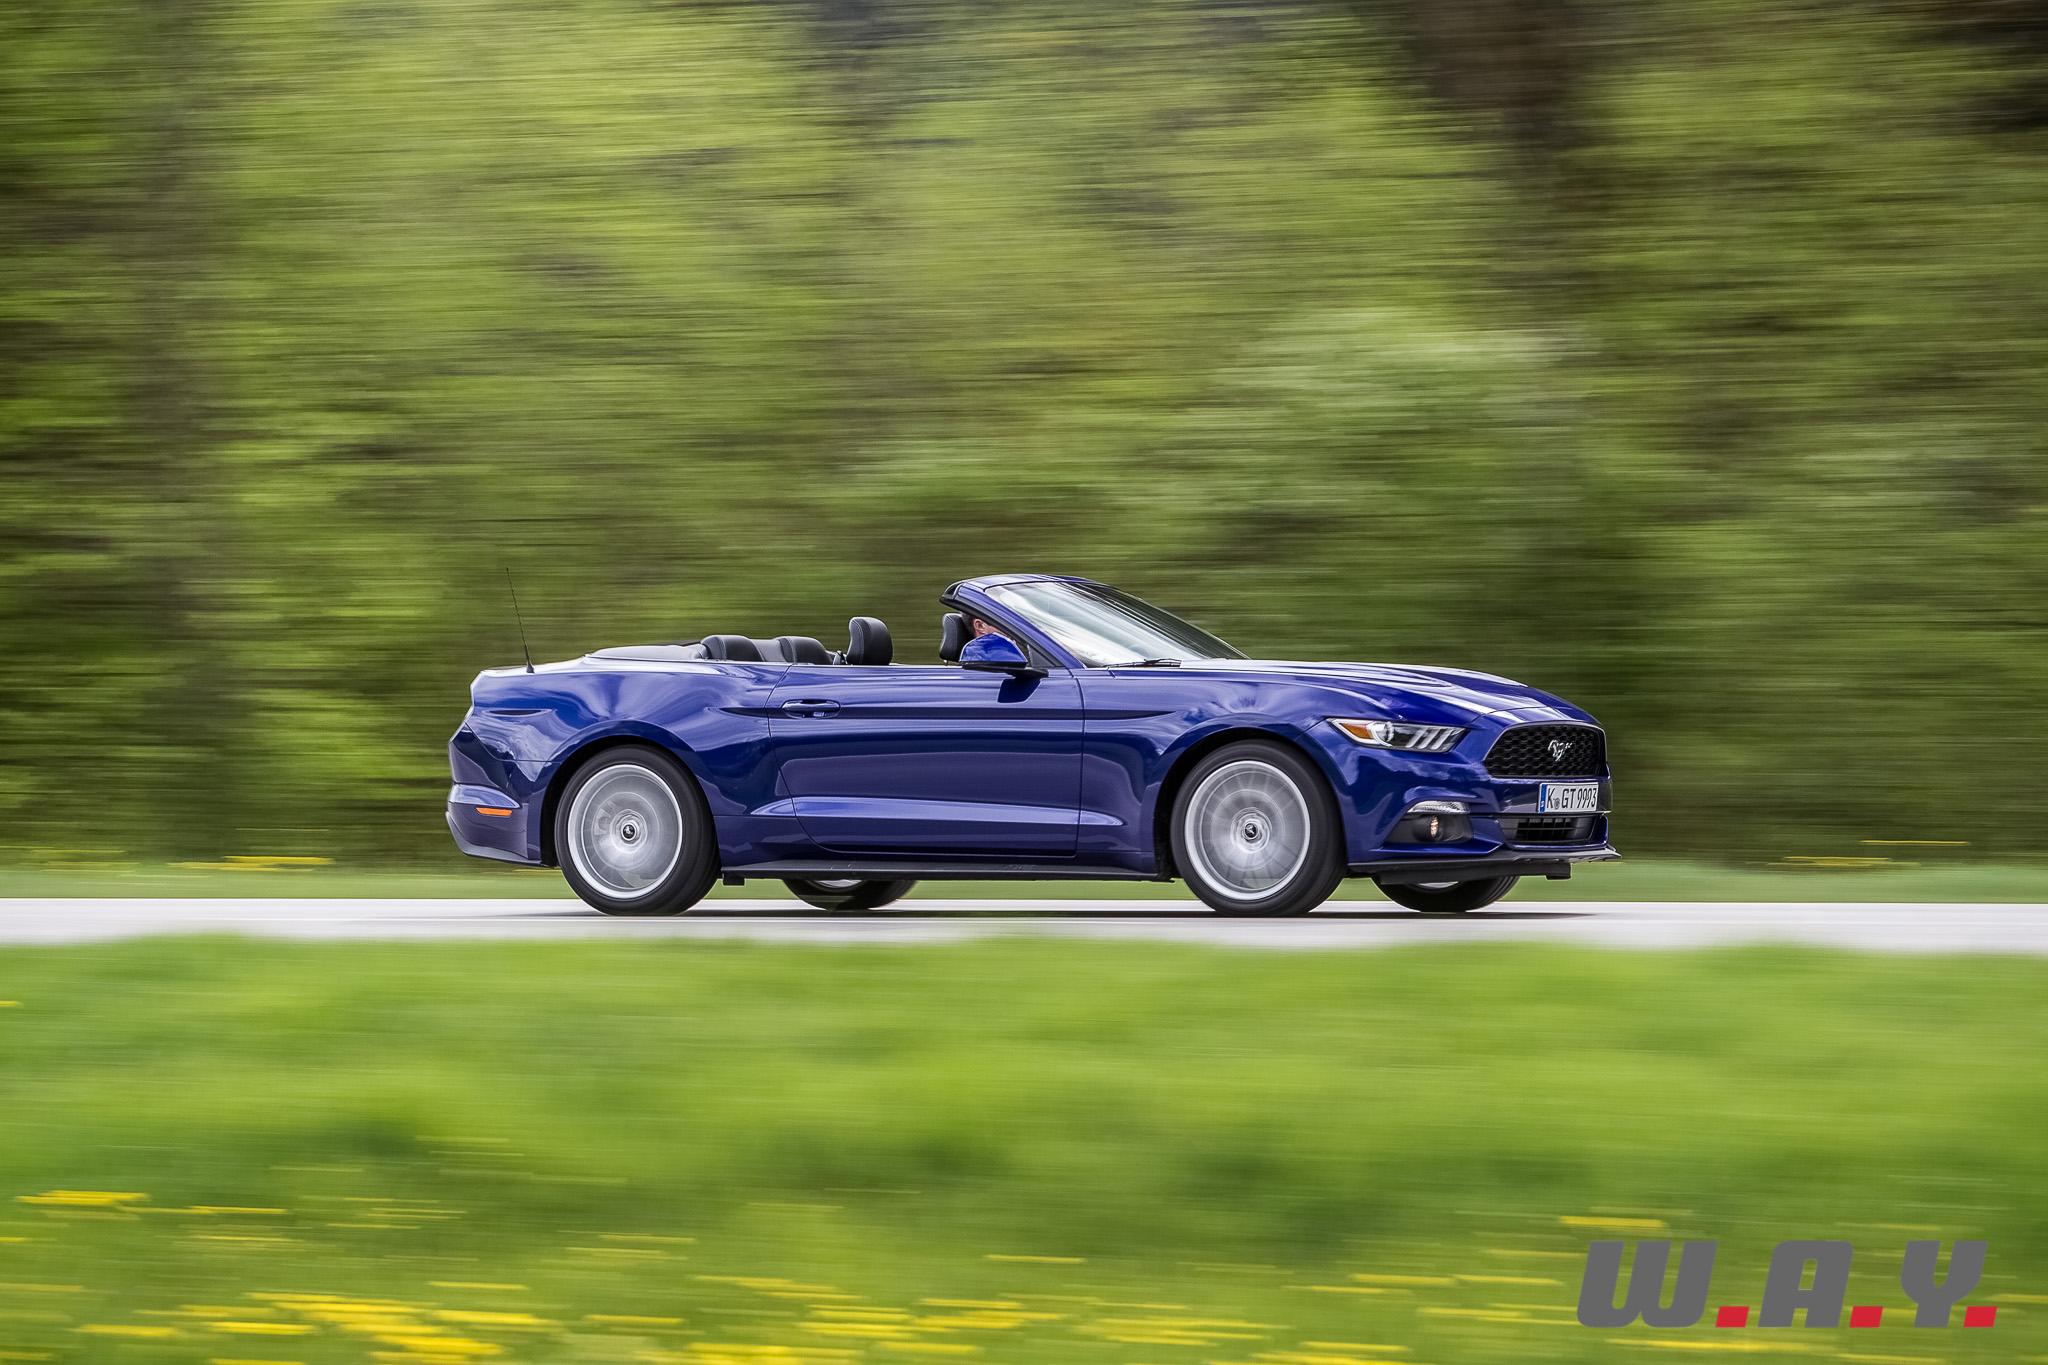 Mustang-08